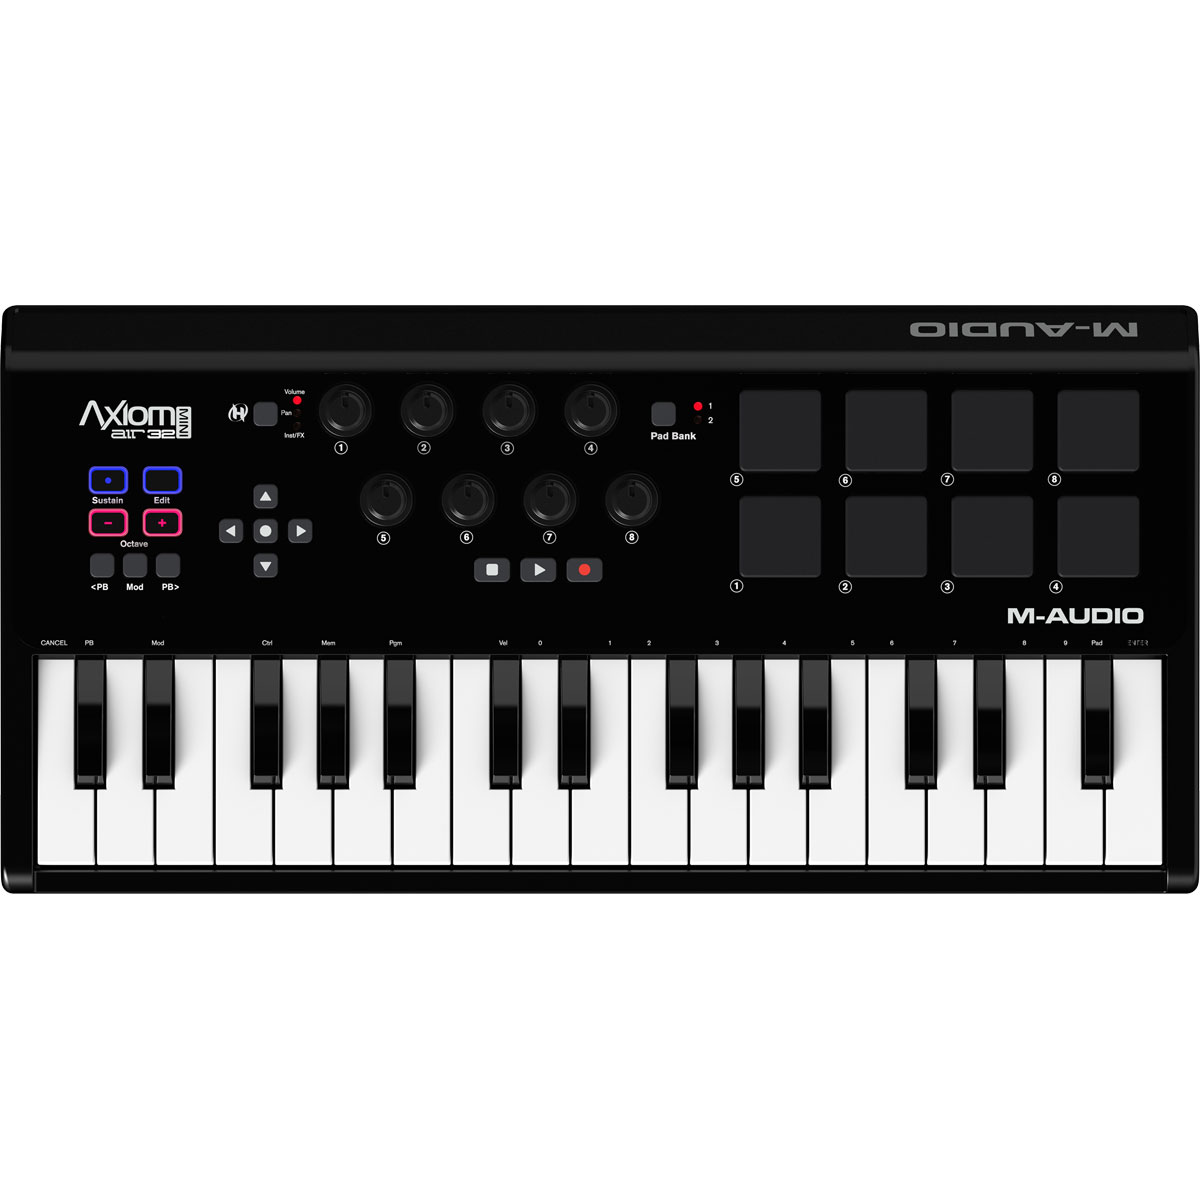 m audio axiom air mini 32 clavier home studio m audio. Black Bedroom Furniture Sets. Home Design Ideas